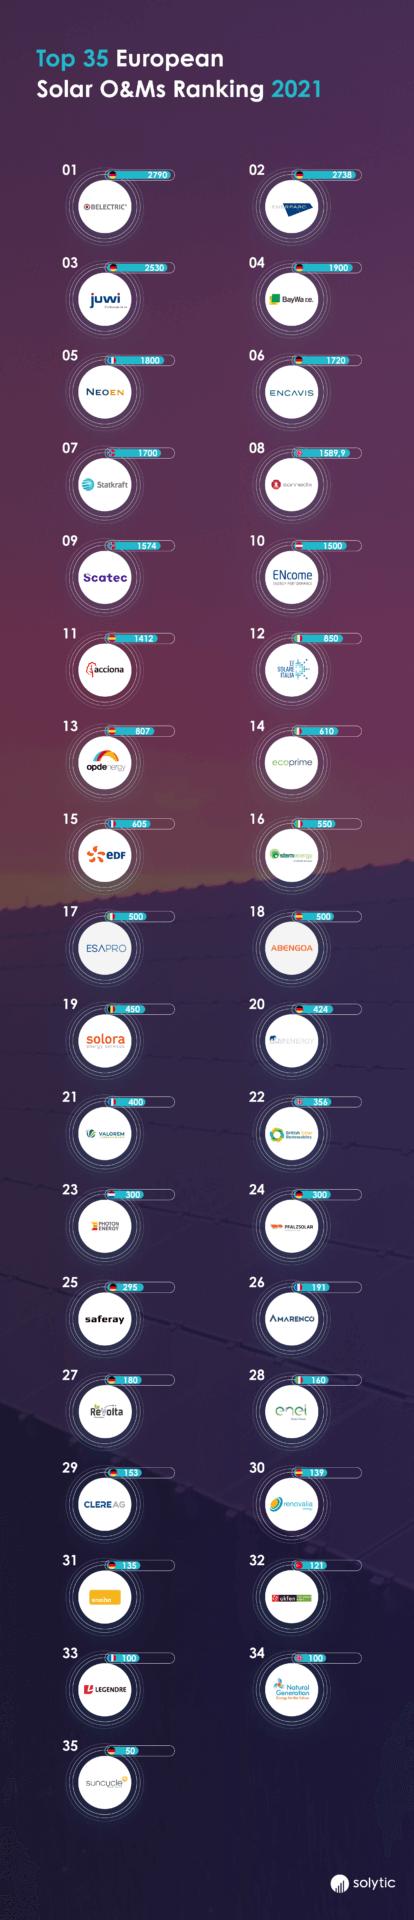 Top European Solar PV O&M Operations Ranking